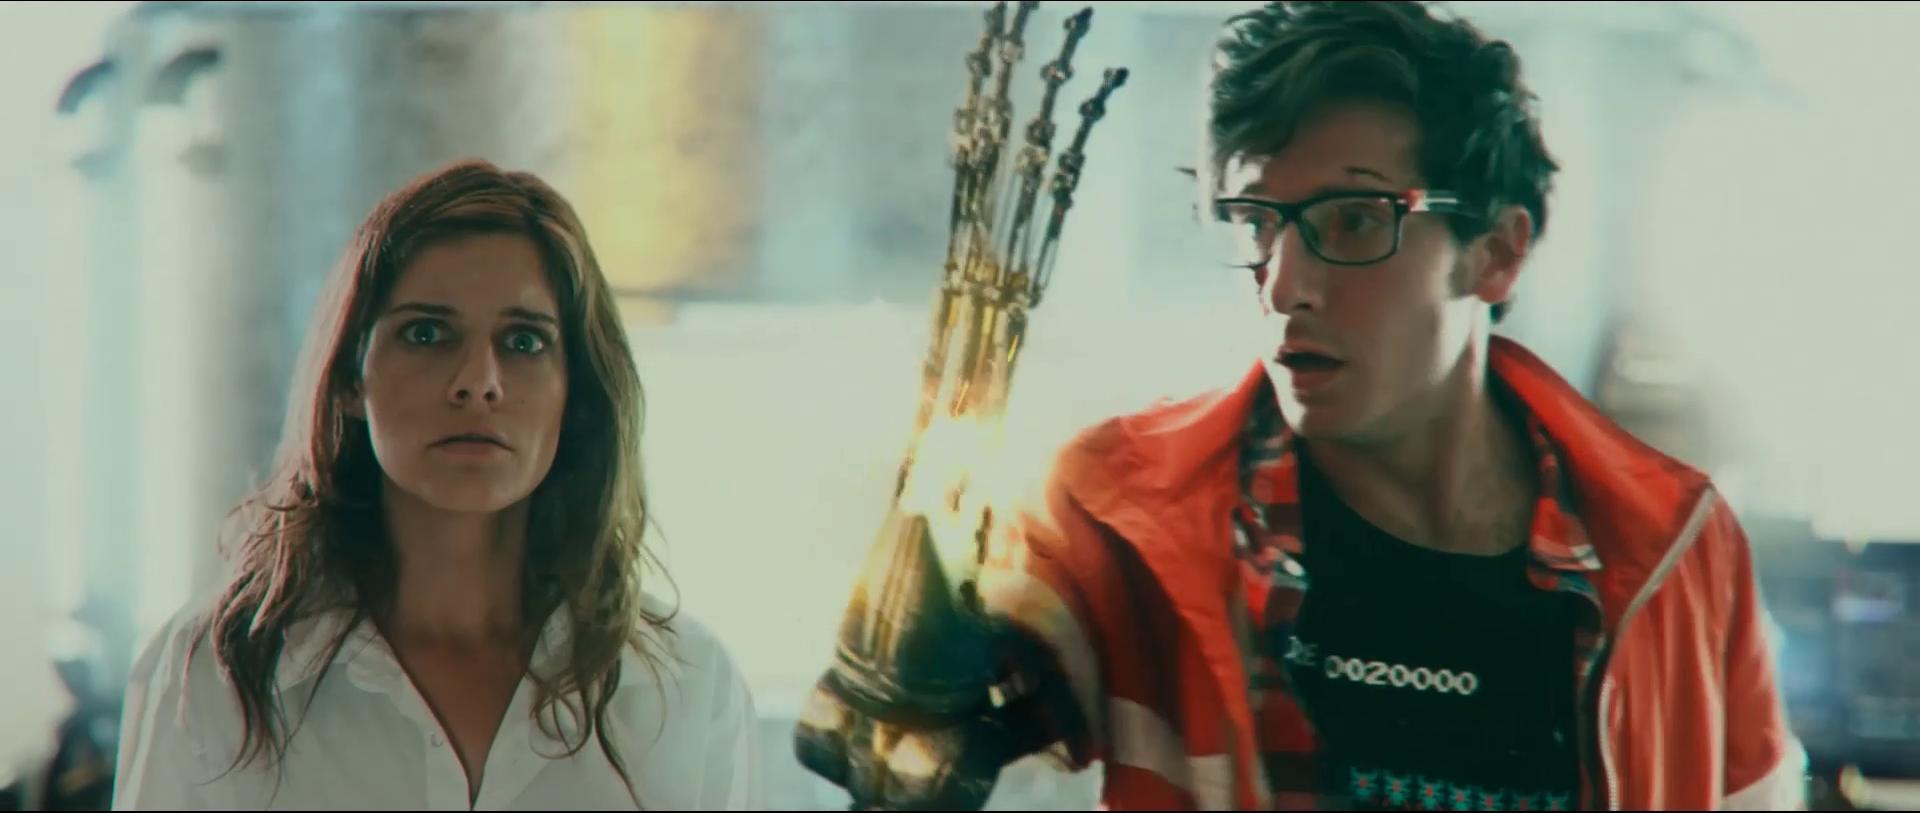 OMG! I'm A Robot (Feature Film)